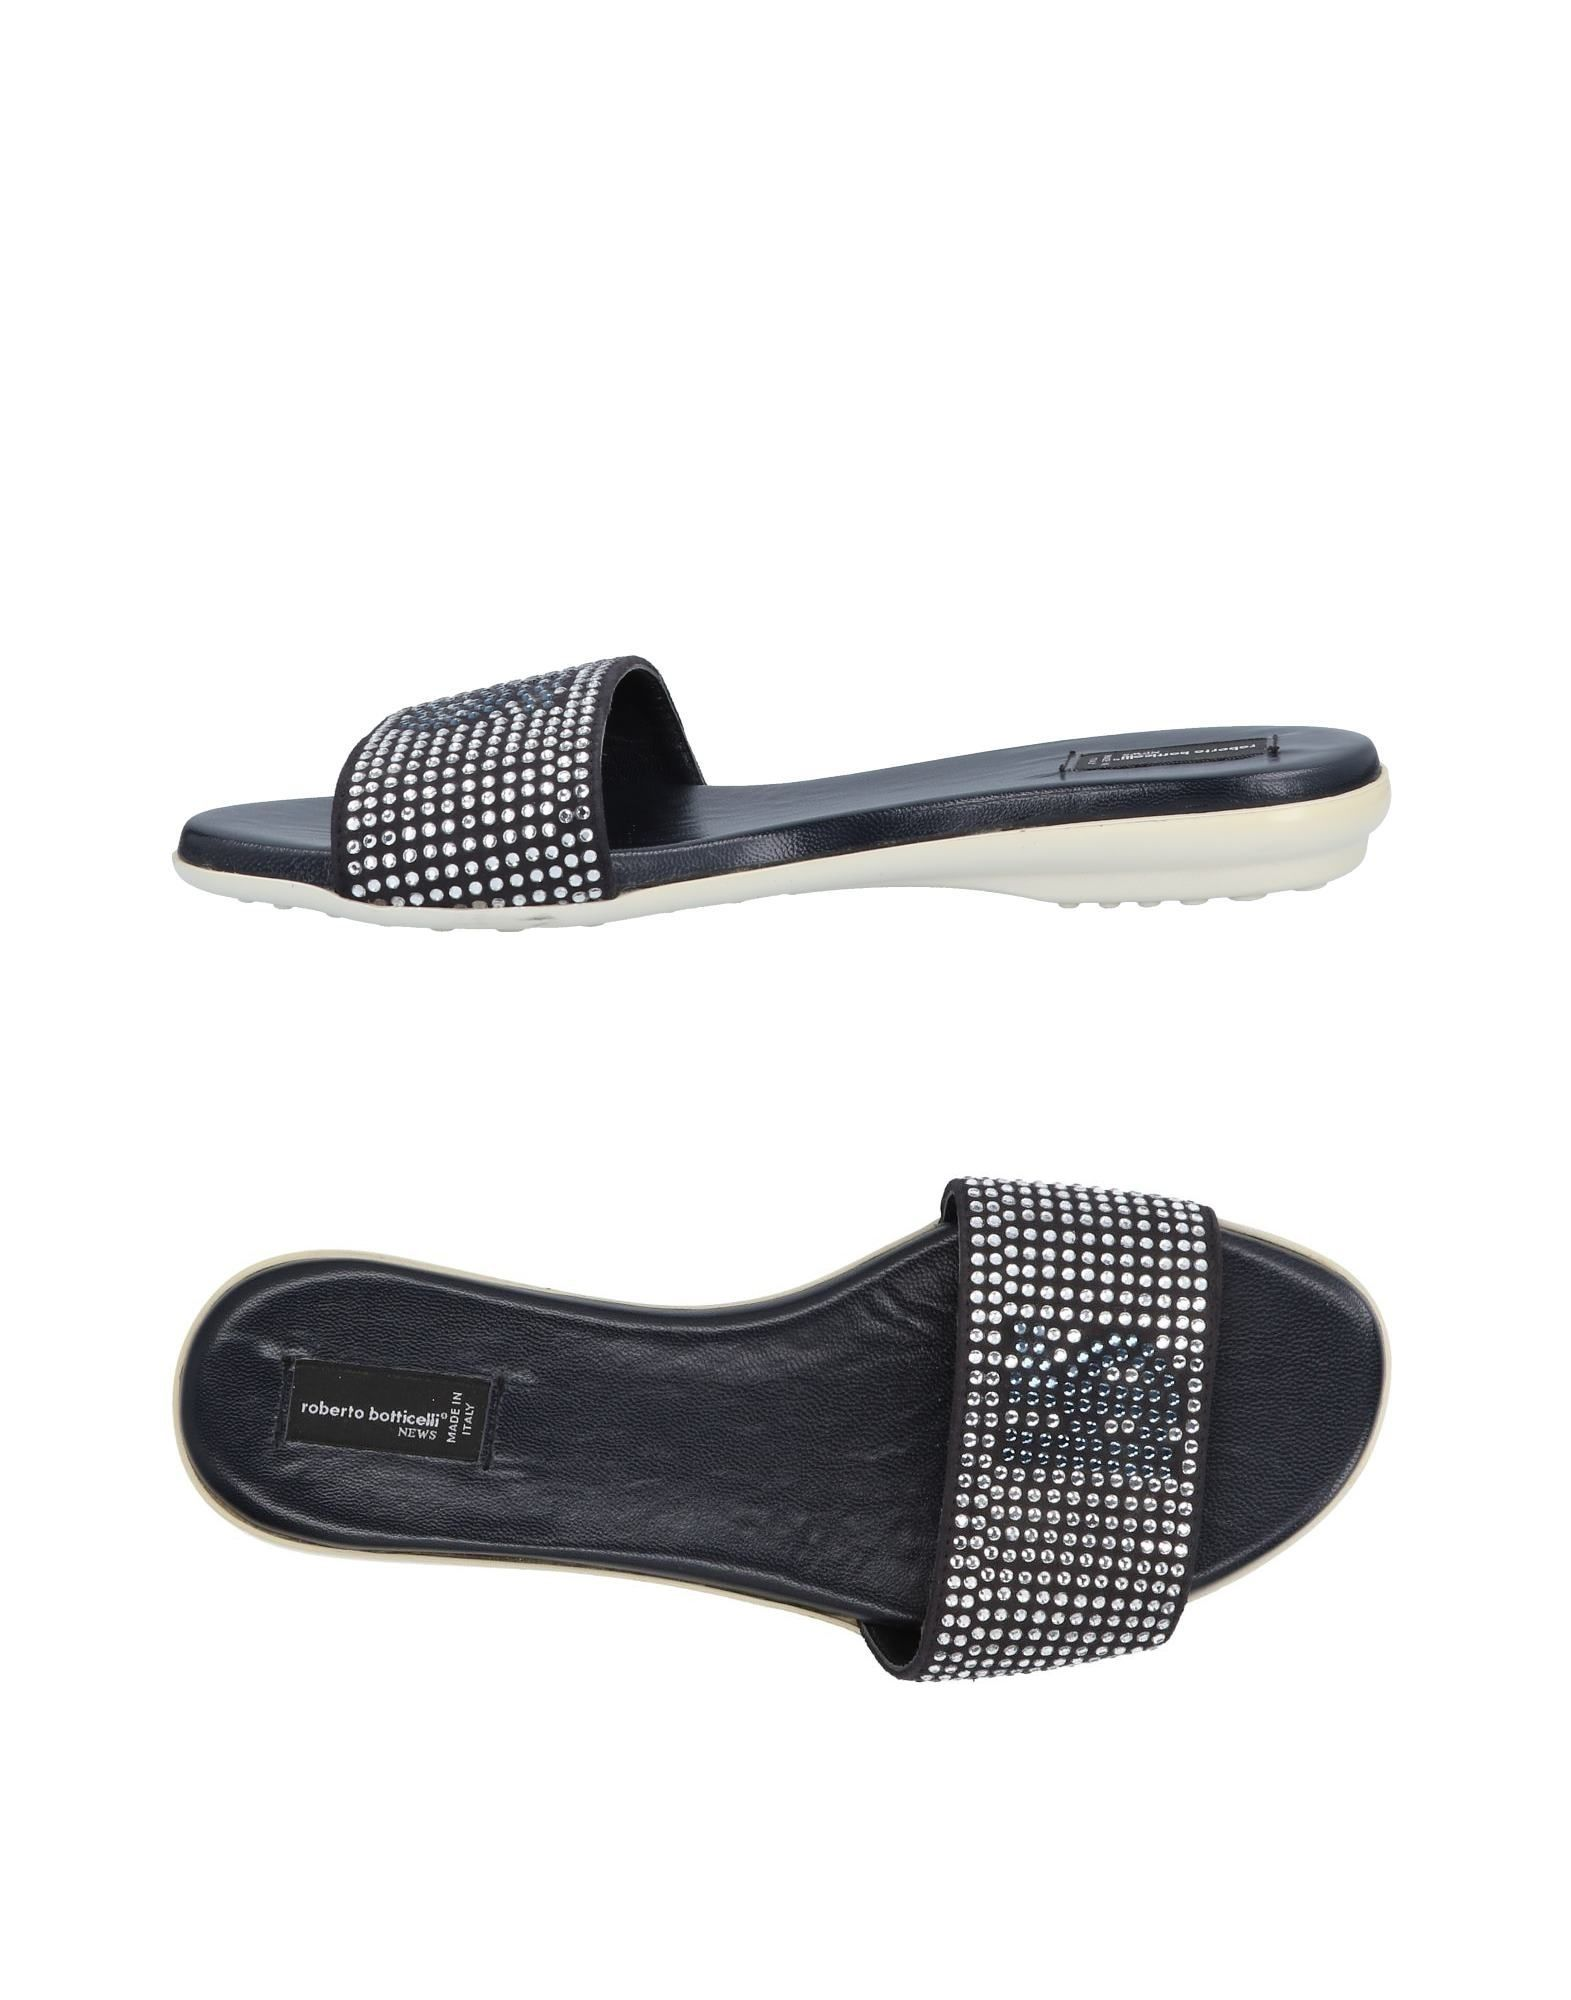 Roberto Botticelli Sandalen Damen beliebte  11498597HP Gute Qualität beliebte Damen Schuhe 0f6028